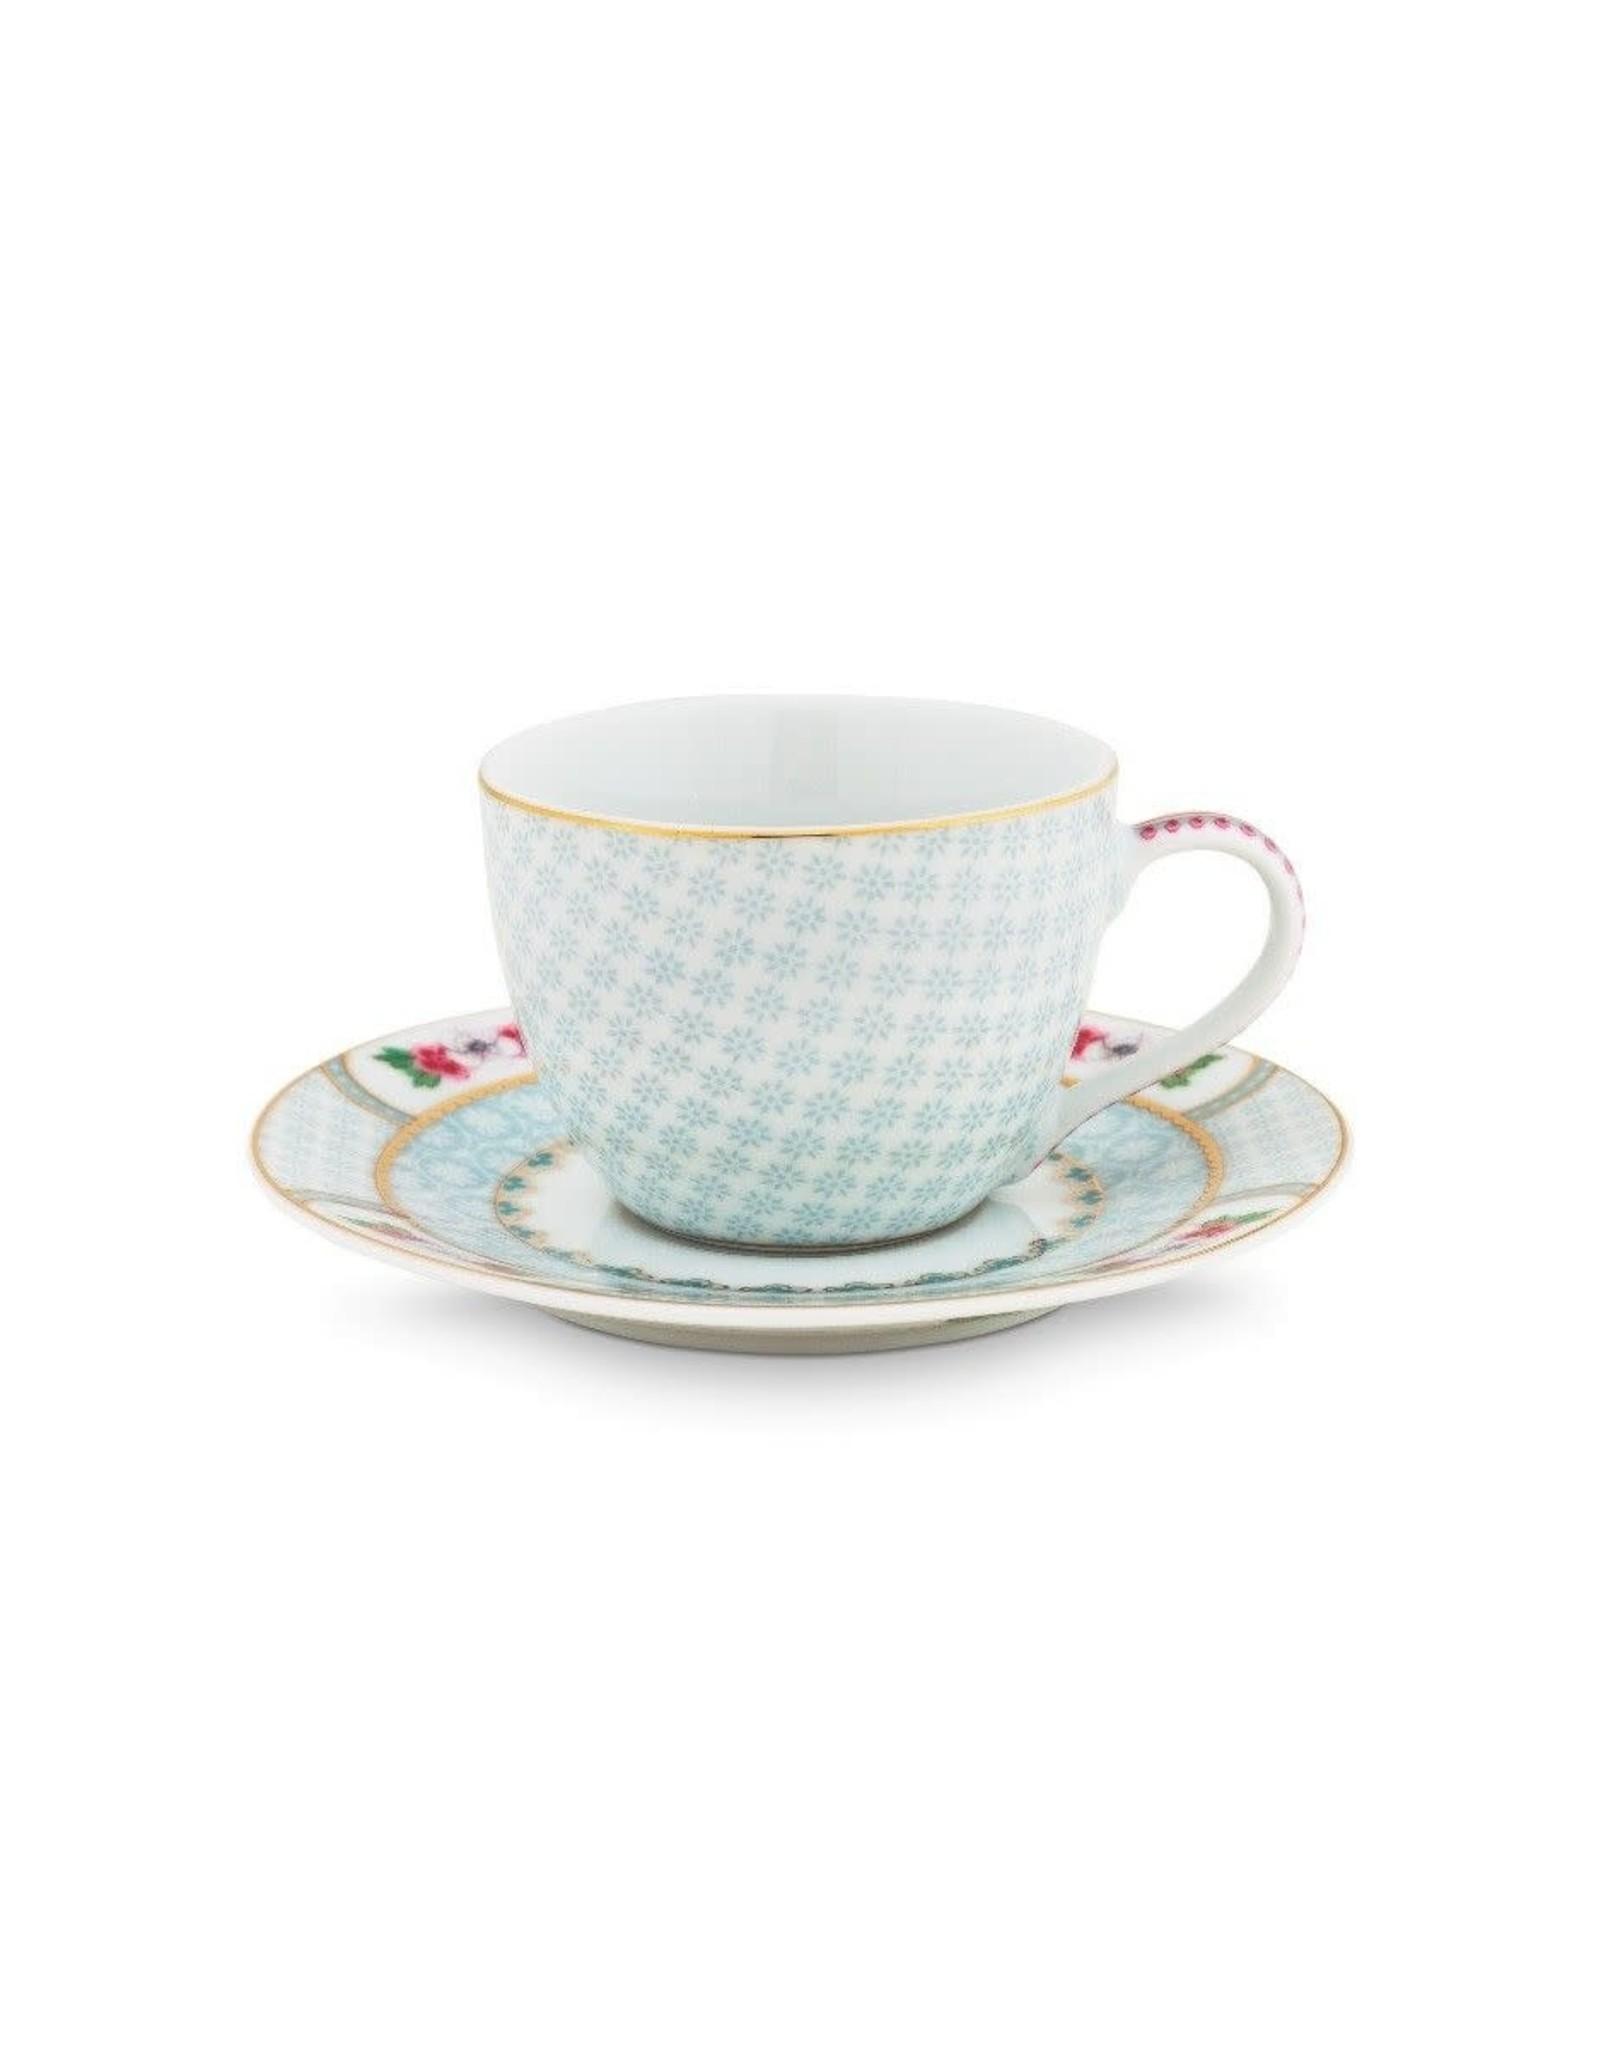 pip-studio Espresso Cup & Saucer Blushing Birds White 120ml